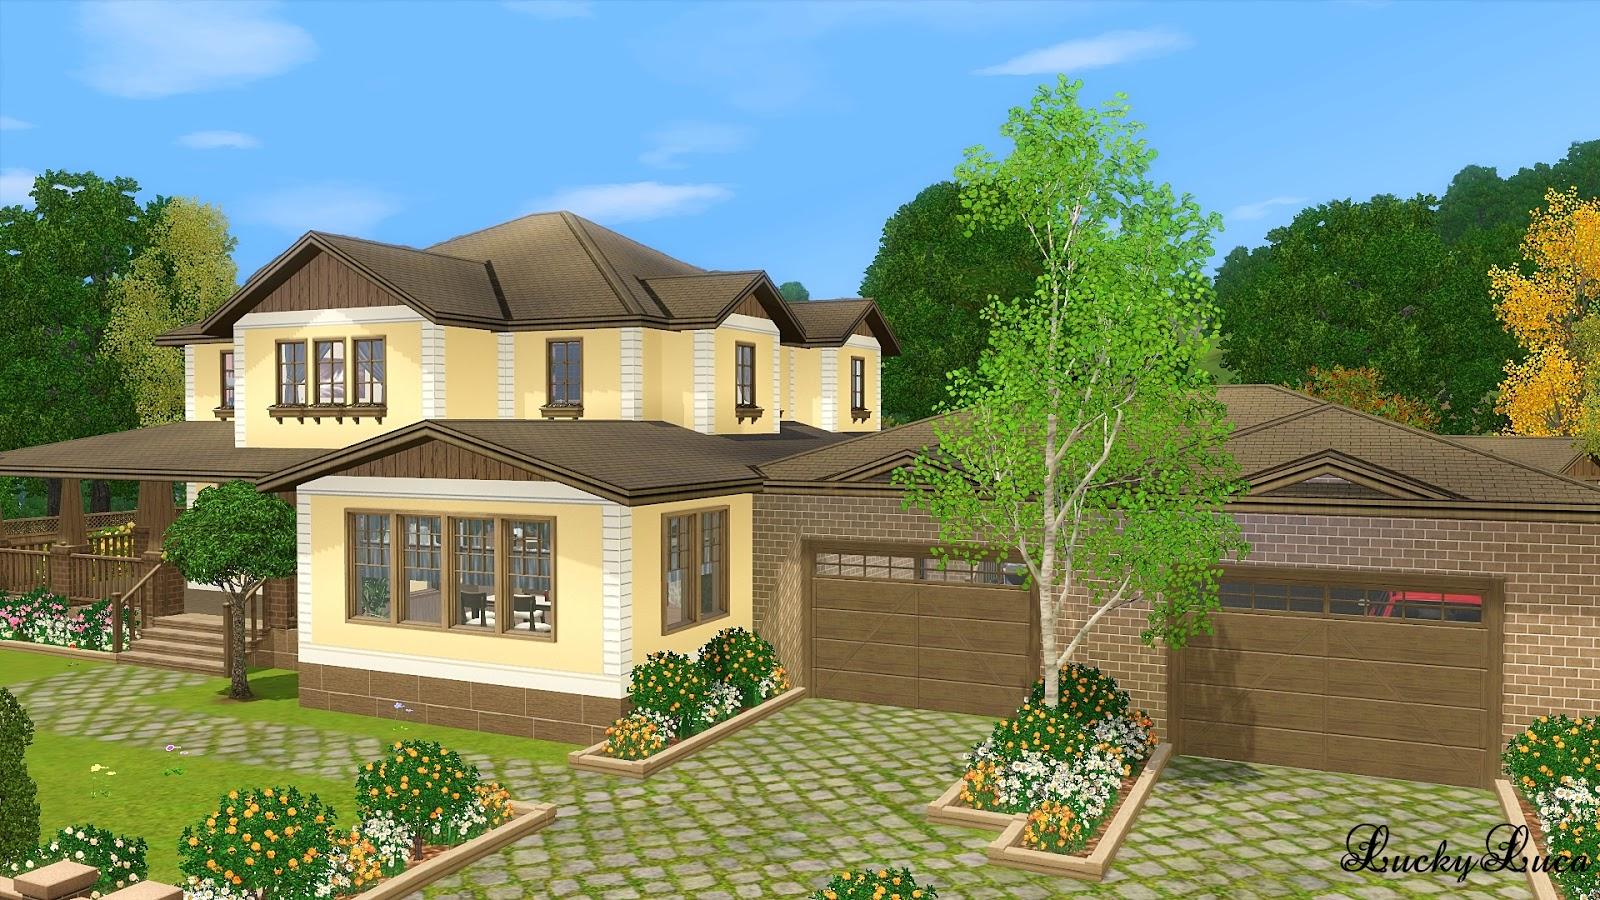 The sims 3 custom content shoes joy studio design for Sims 3 family home ideas